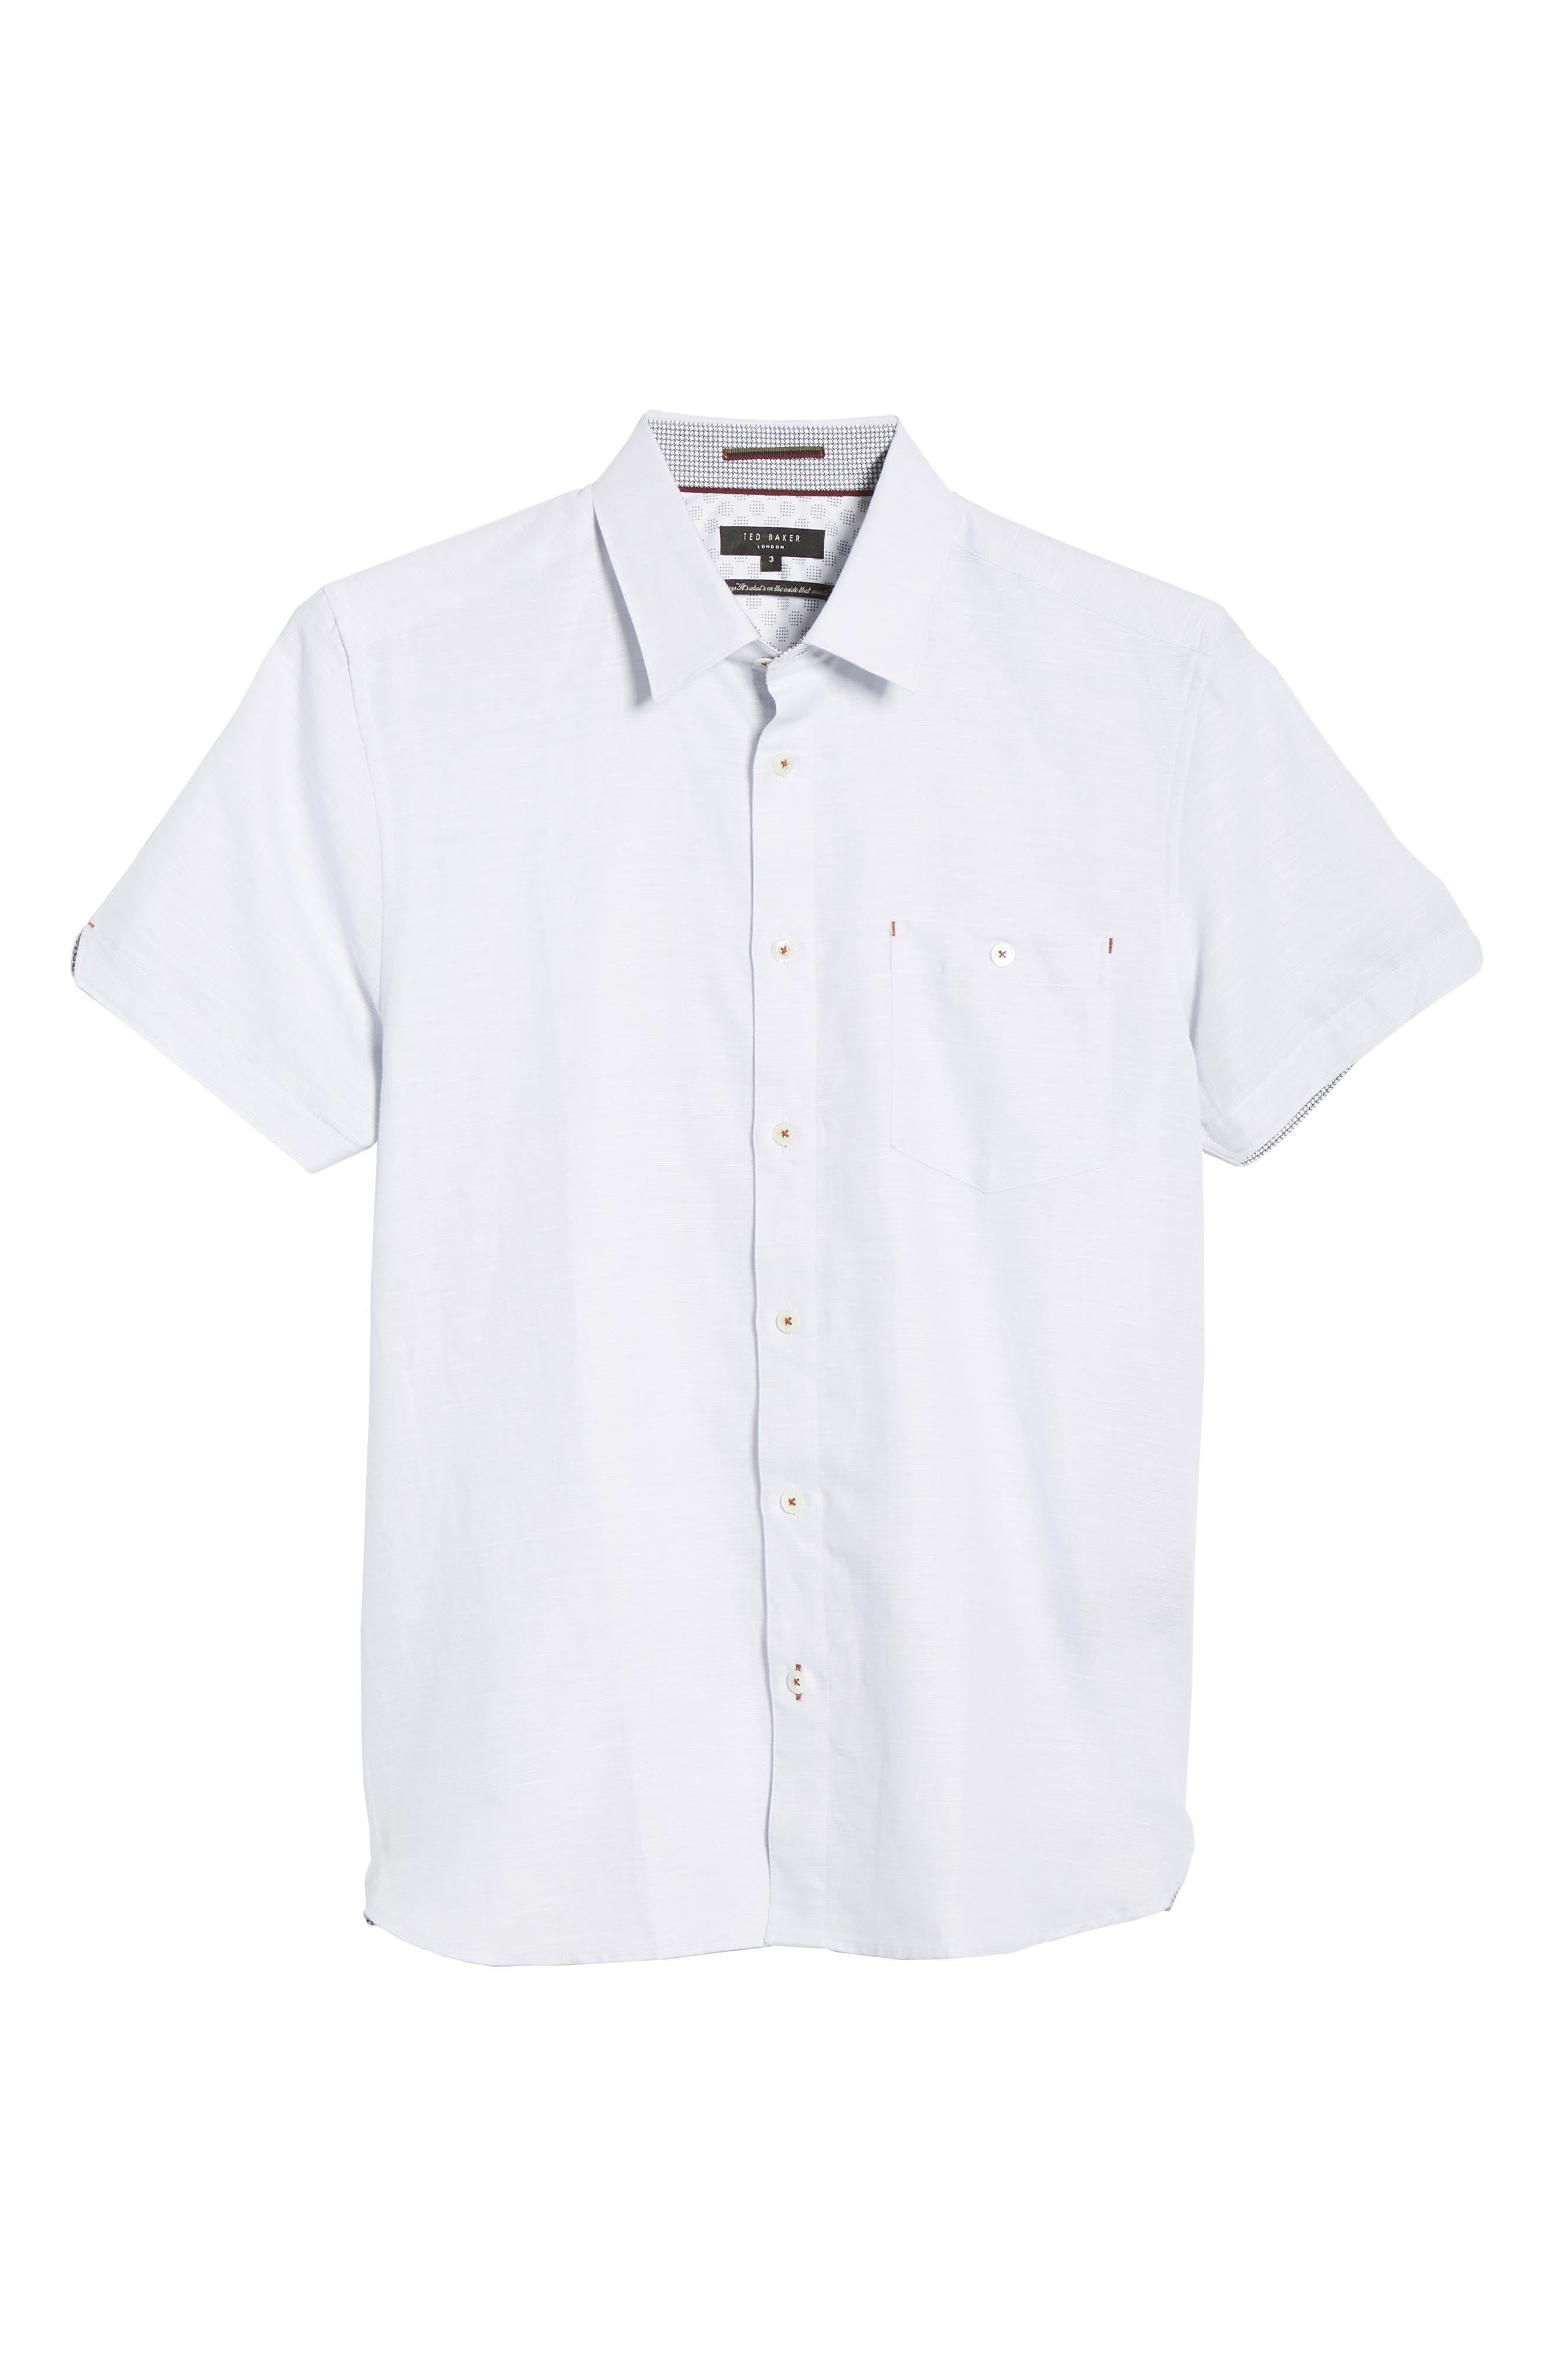 TED BAKER LONDON, Graphit Slim Fit Cotton & Linen Sport Shirt, Alternate thumbnail 5, color, GREY